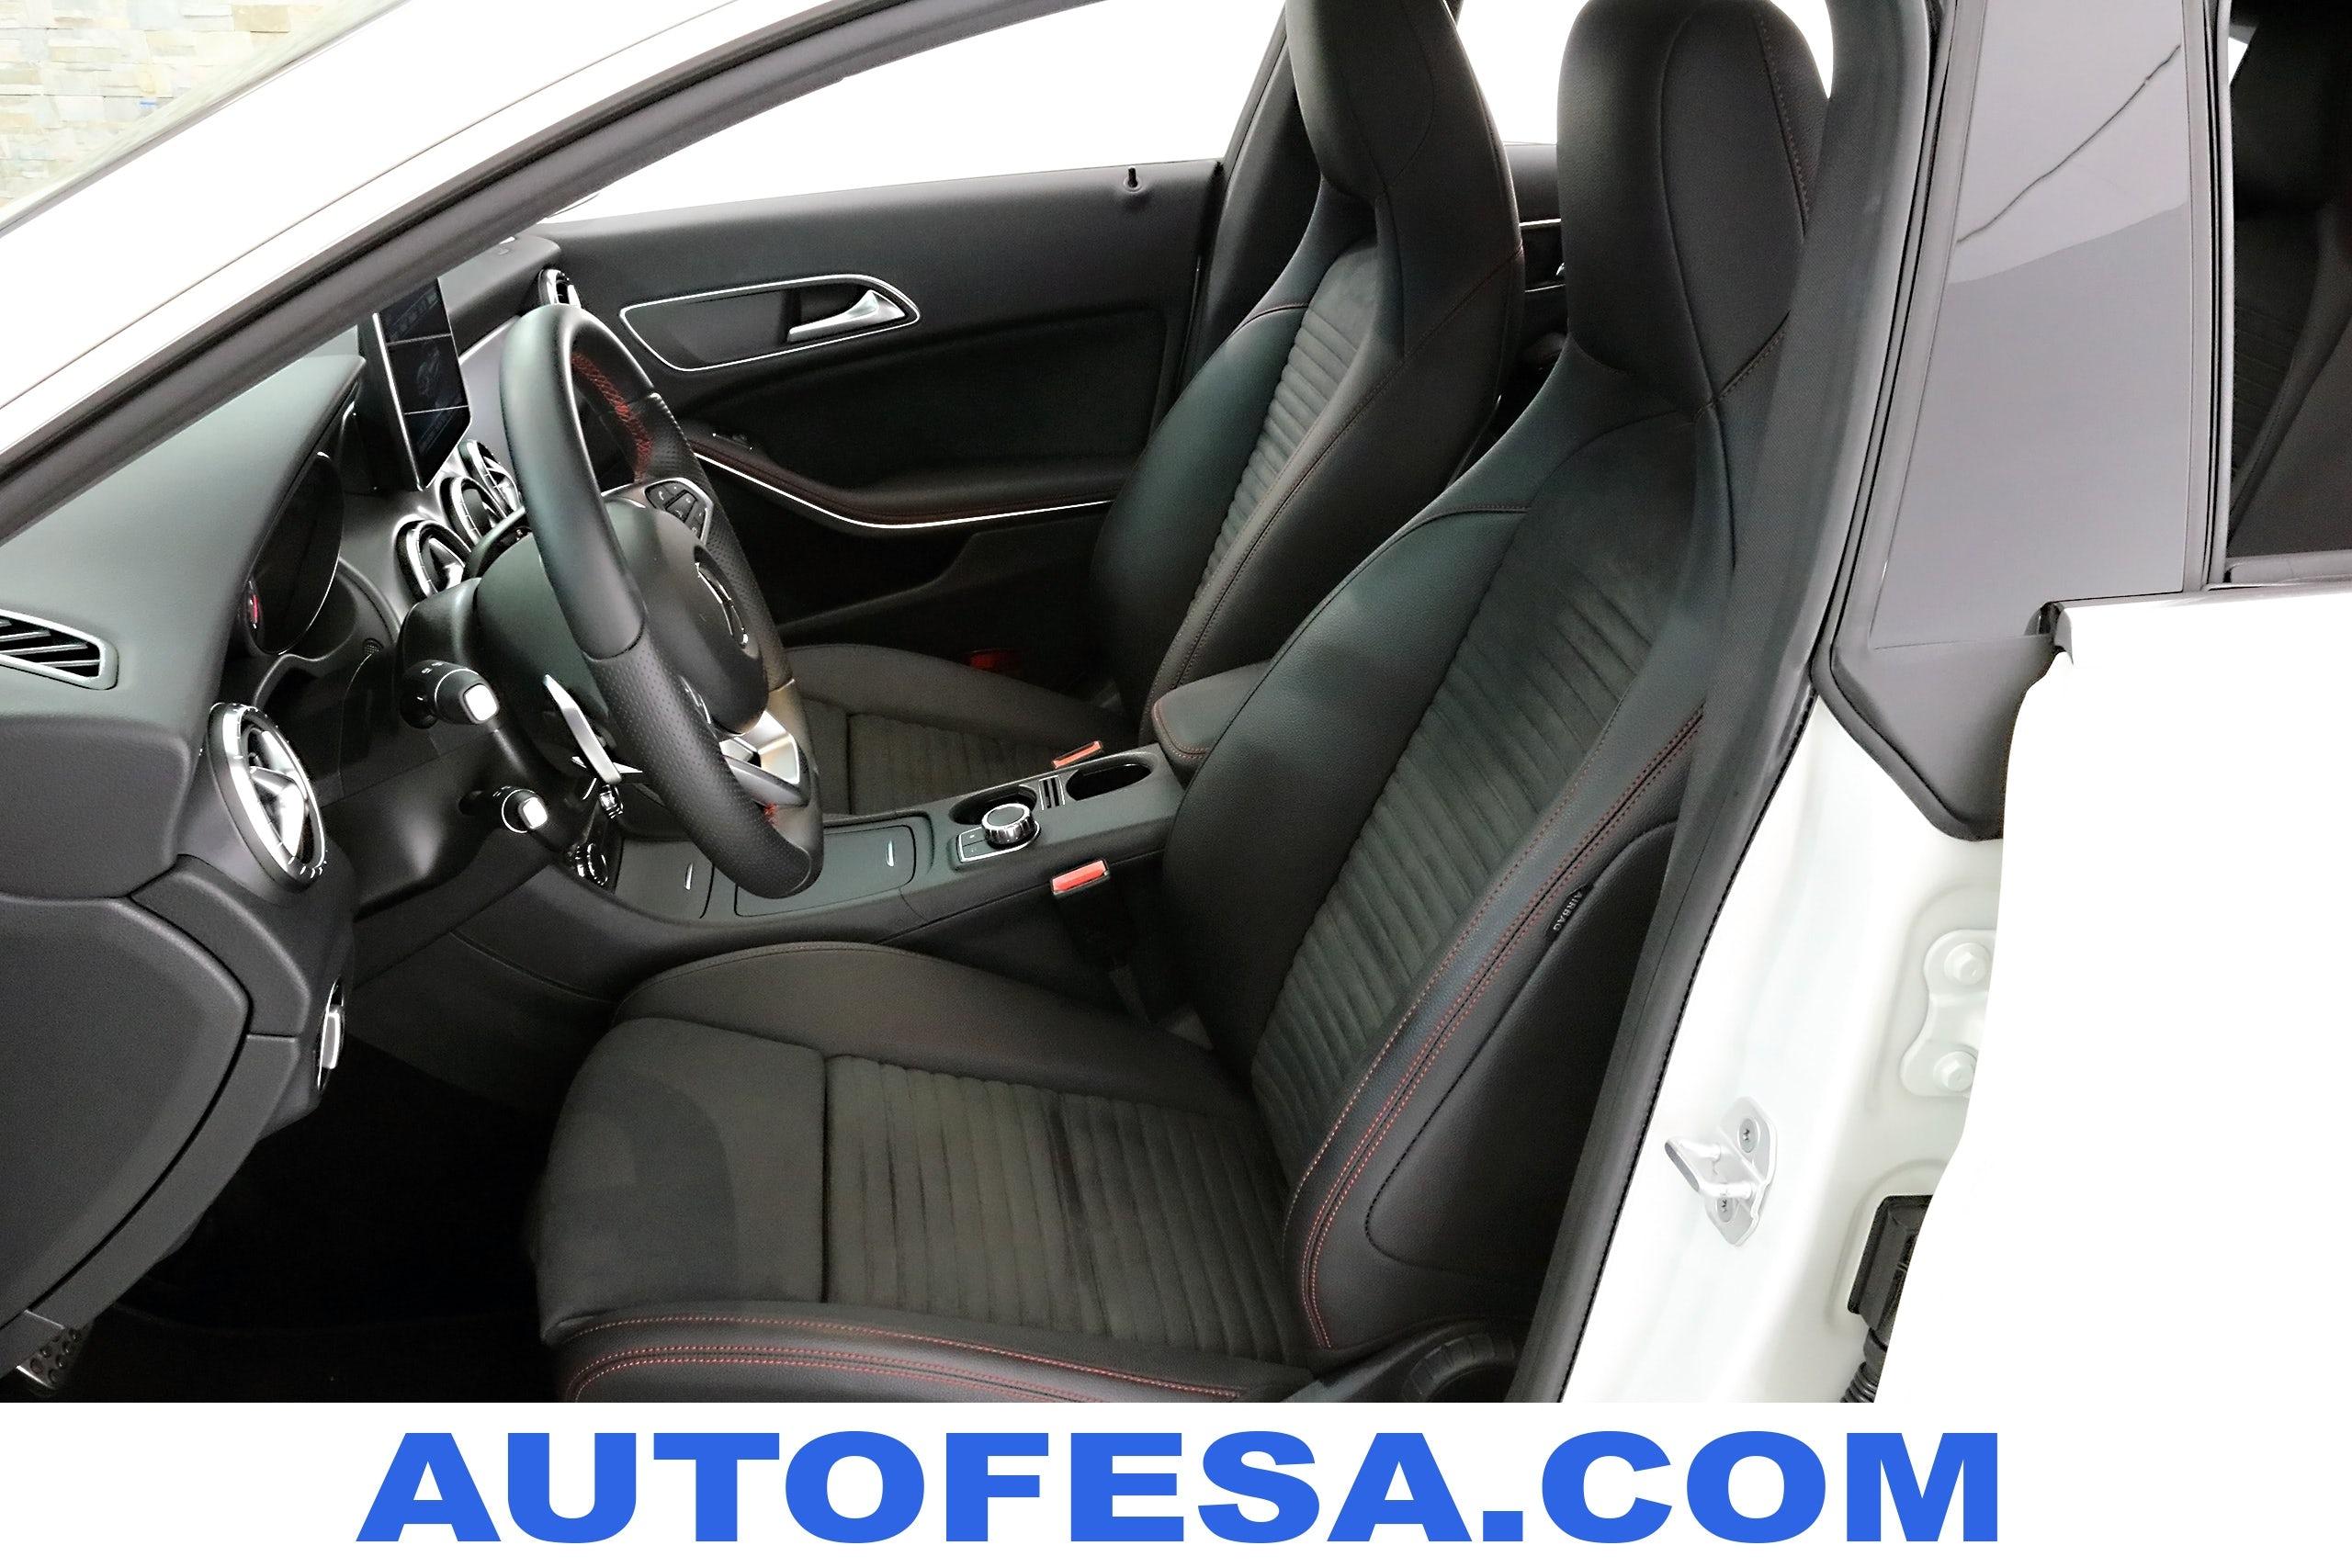 Mercedes-benz Cla 220 CLA 220 CDI 177cv 4p AMG Auto S/S - Foto 33